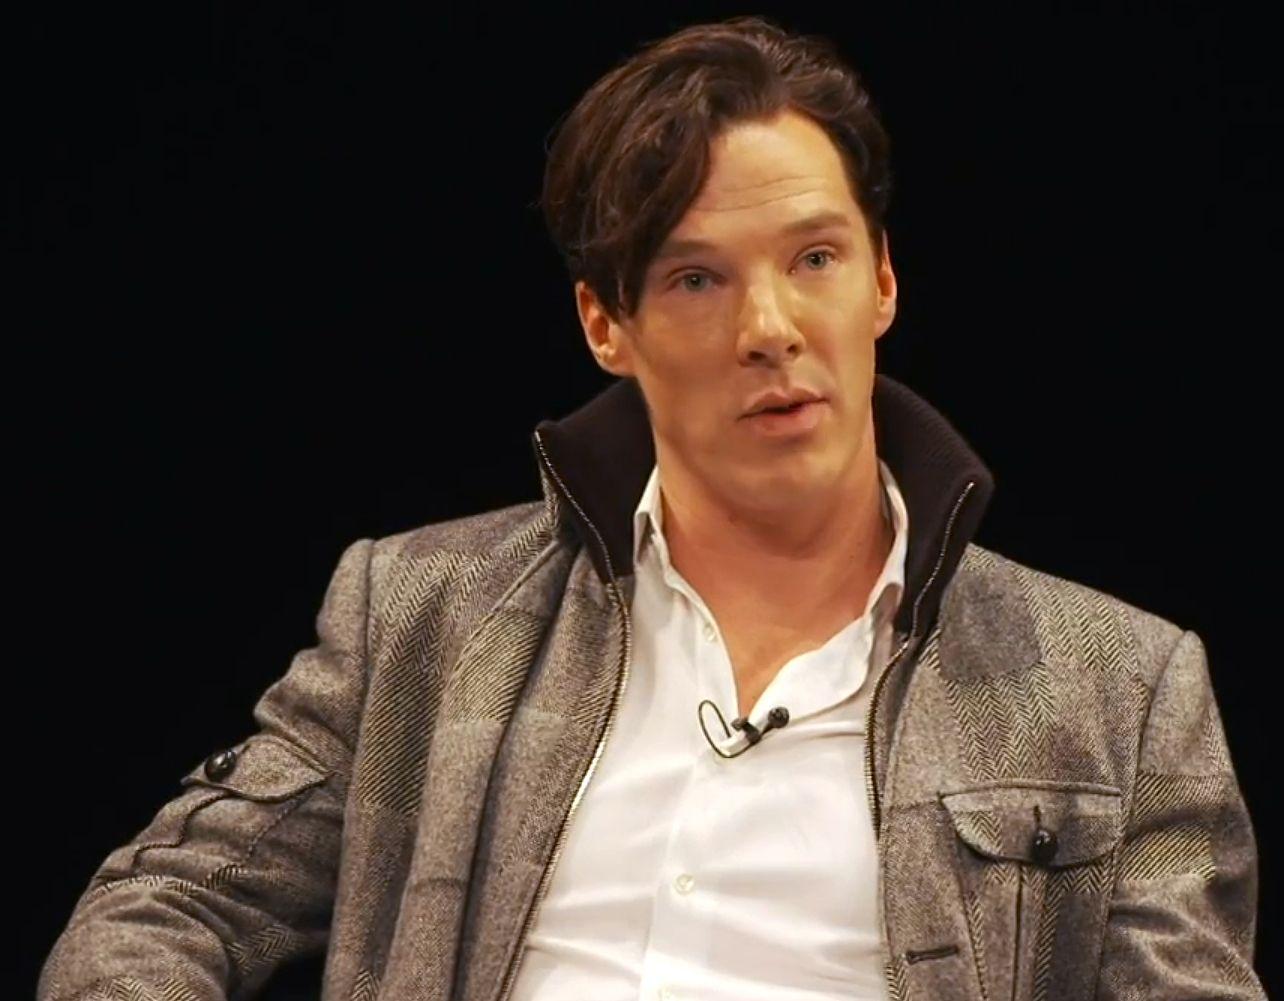 Cutest Haircut Ever Benedict Cumberbatch The Benaddictionary